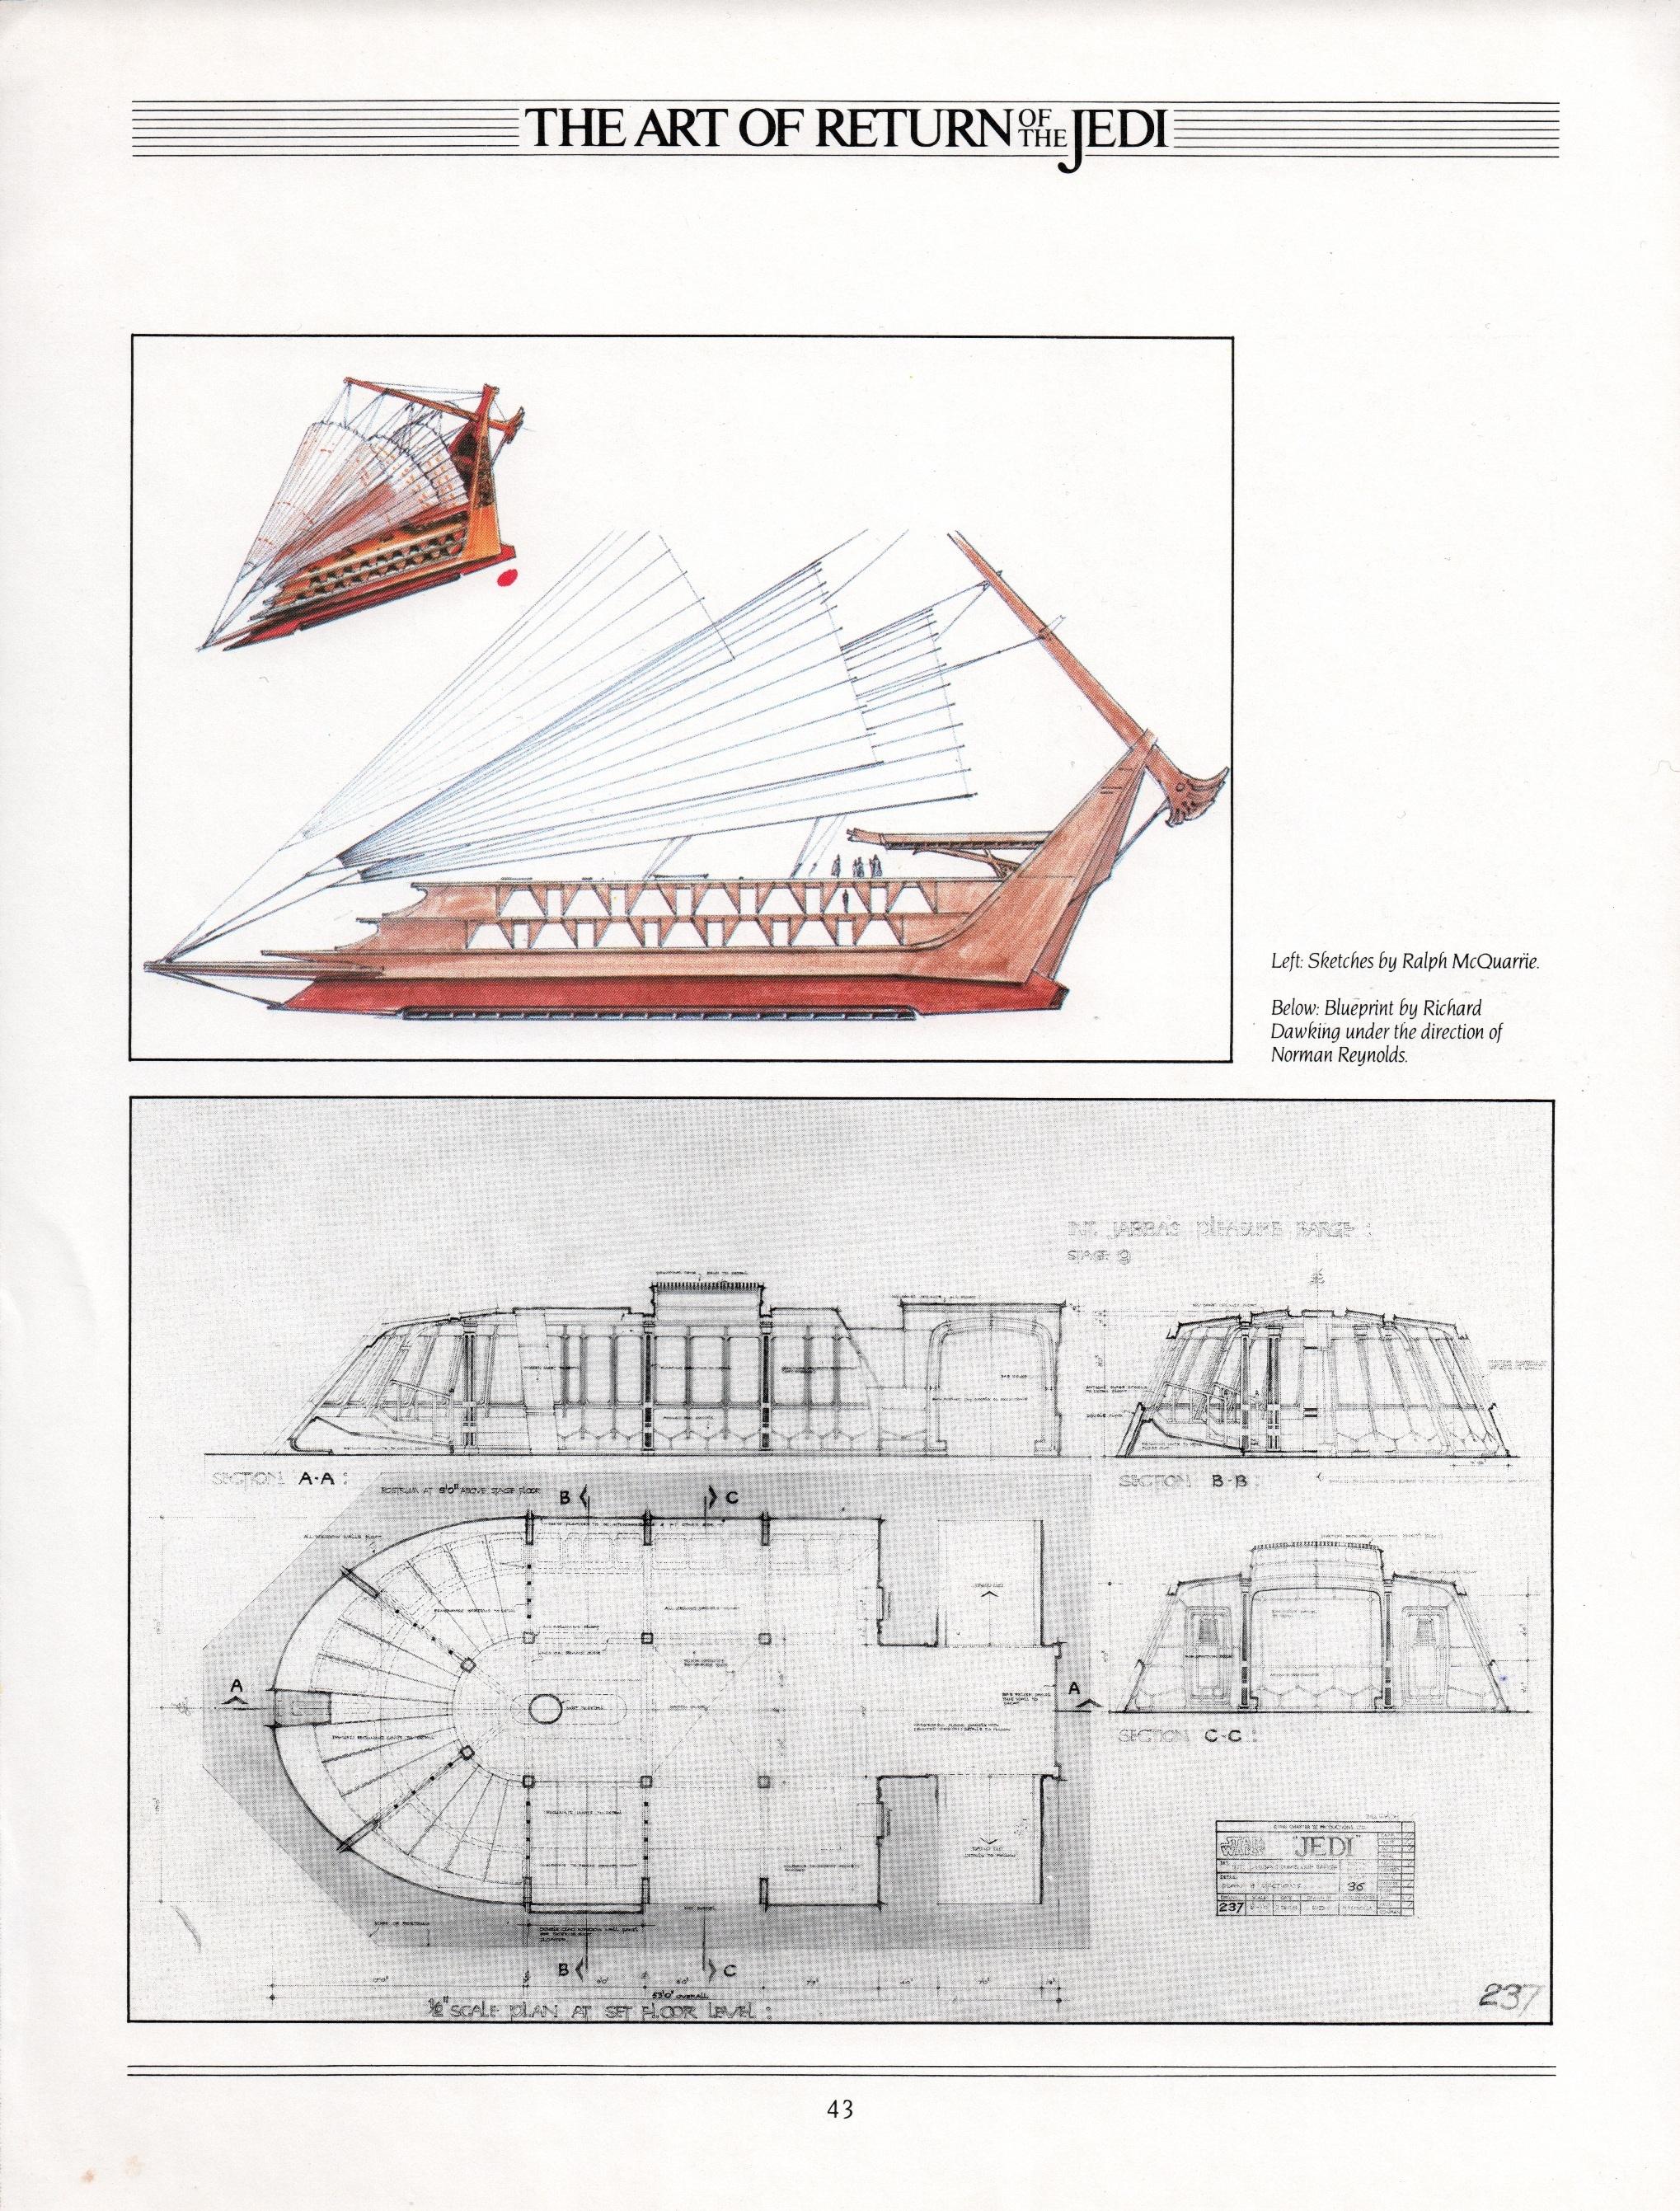 Art of Return of the Jedi (b0bafett_Empire)-p043